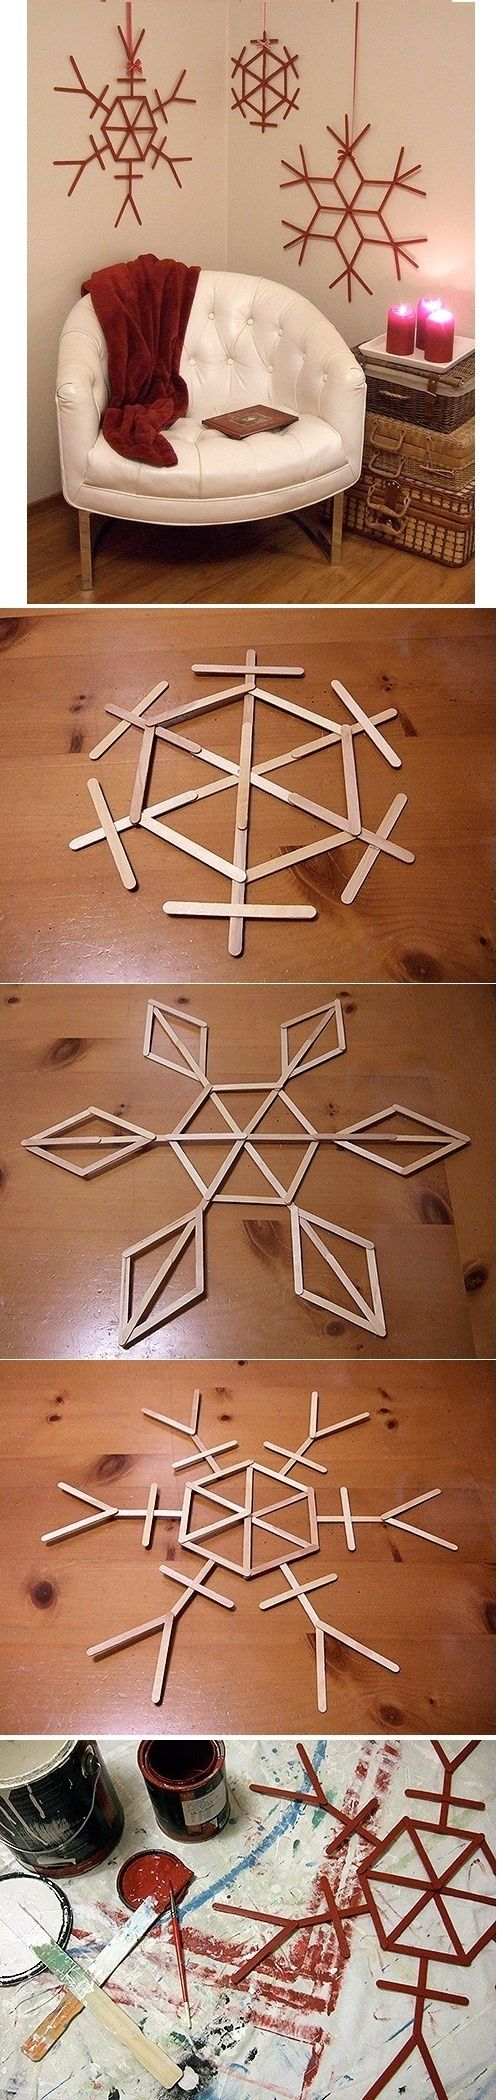 Popsicle Stick Snowflakes.